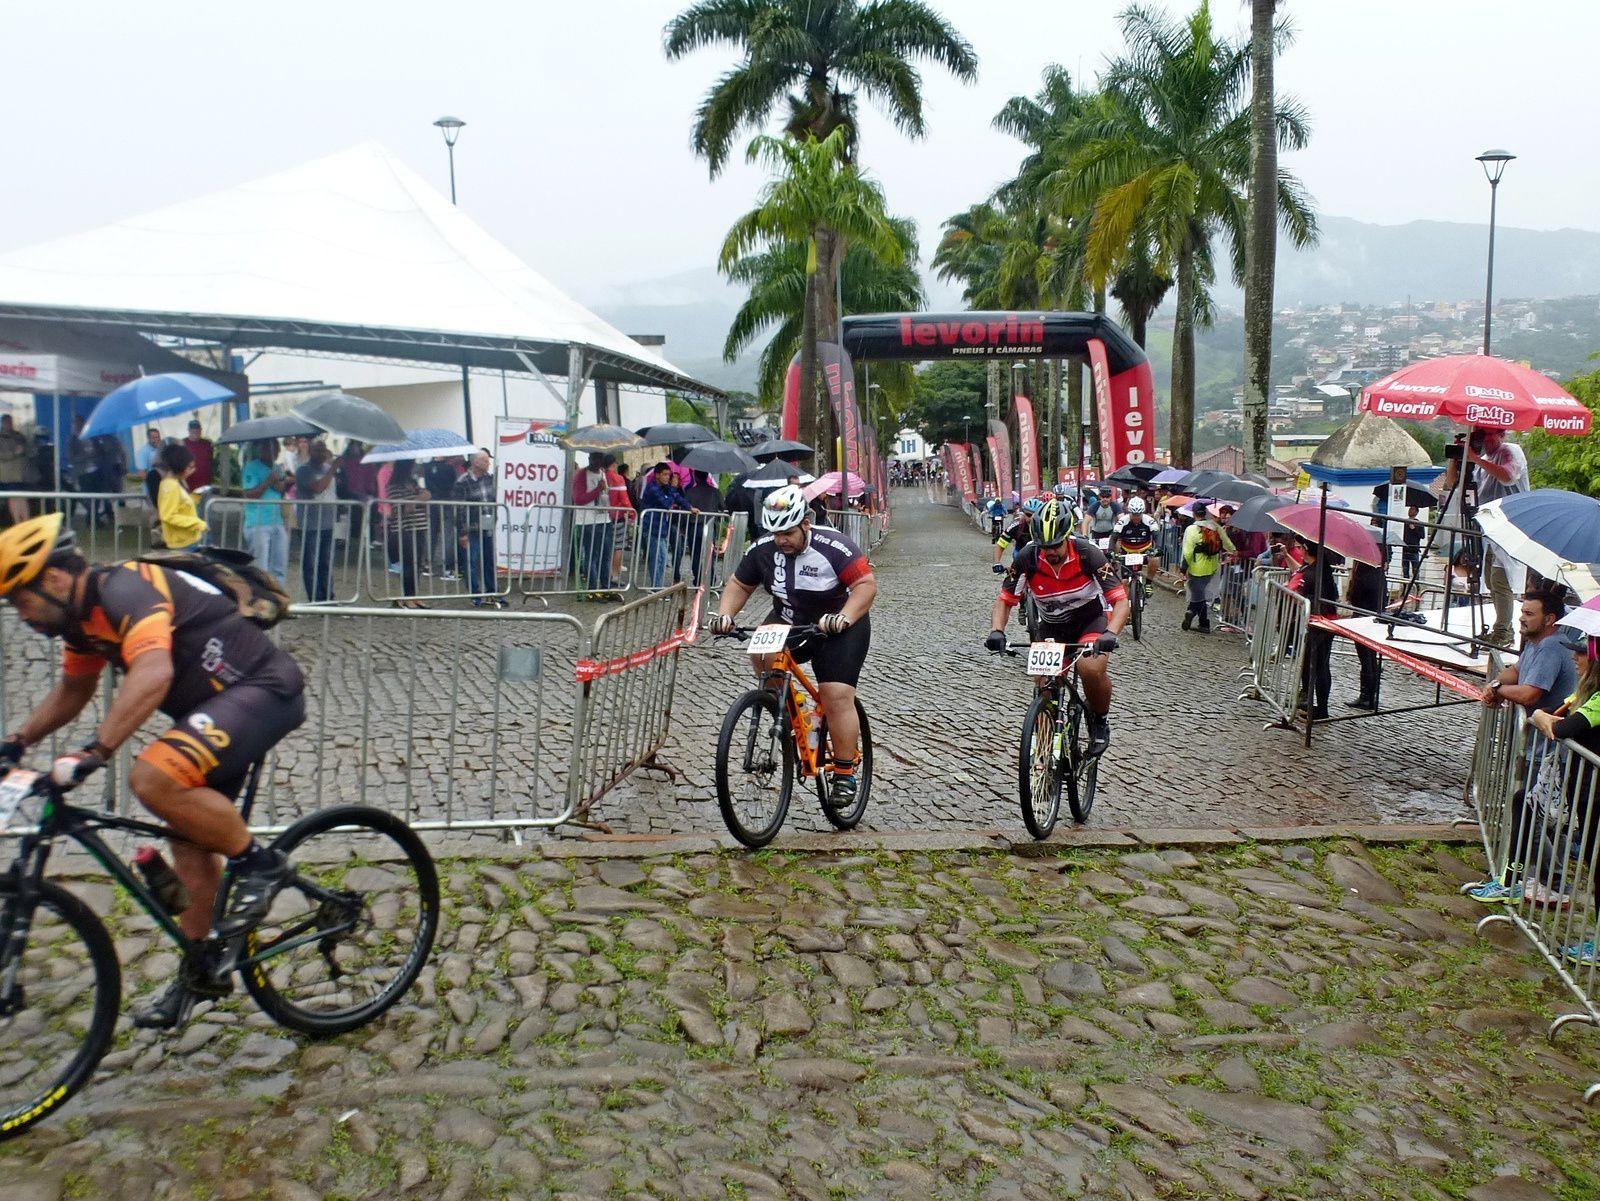 Le Vélo au Brésil. Rio , Sao Paulo, ..., impressions